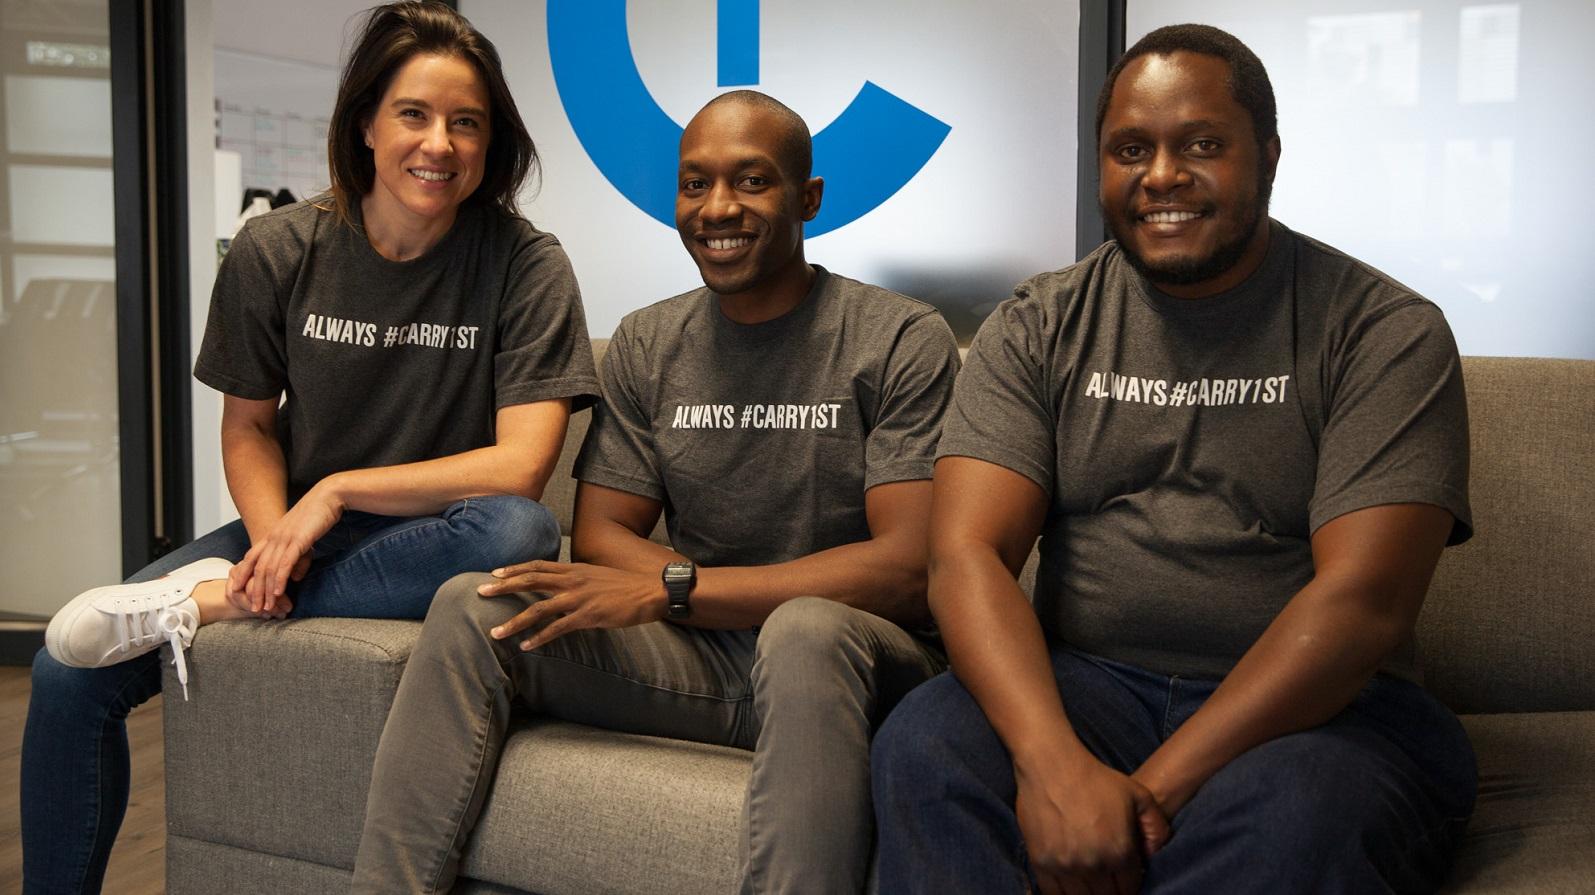 SA startup Carry1st raises $2.5m seed round - Ventureburn